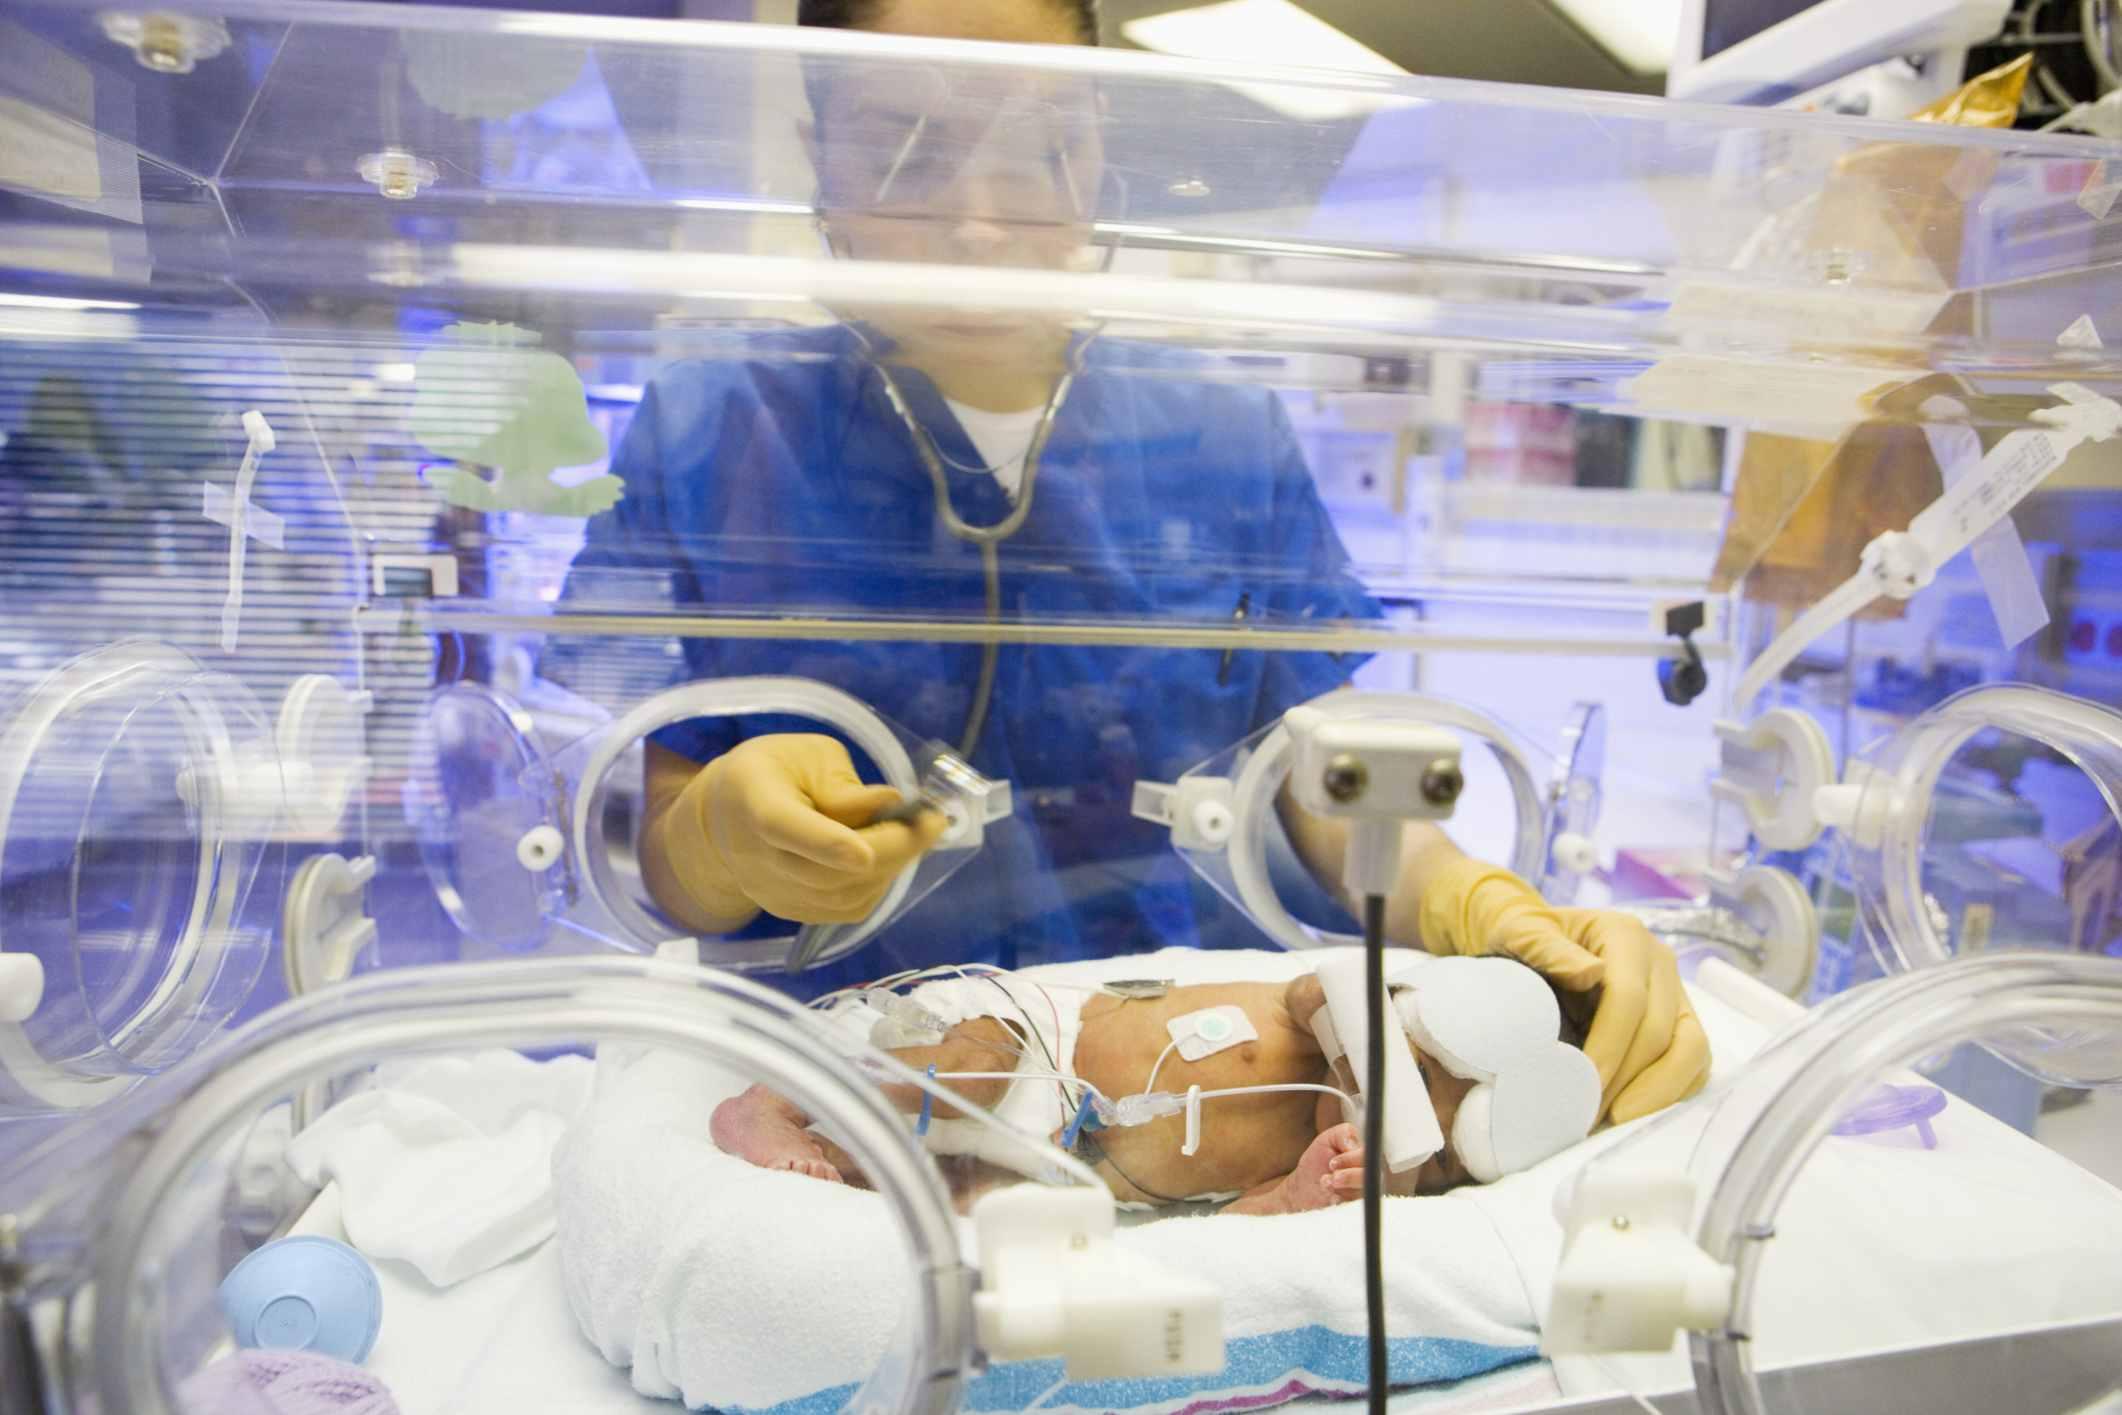 Premature Baby in Incubator NICU Equipment with NICU Nurse